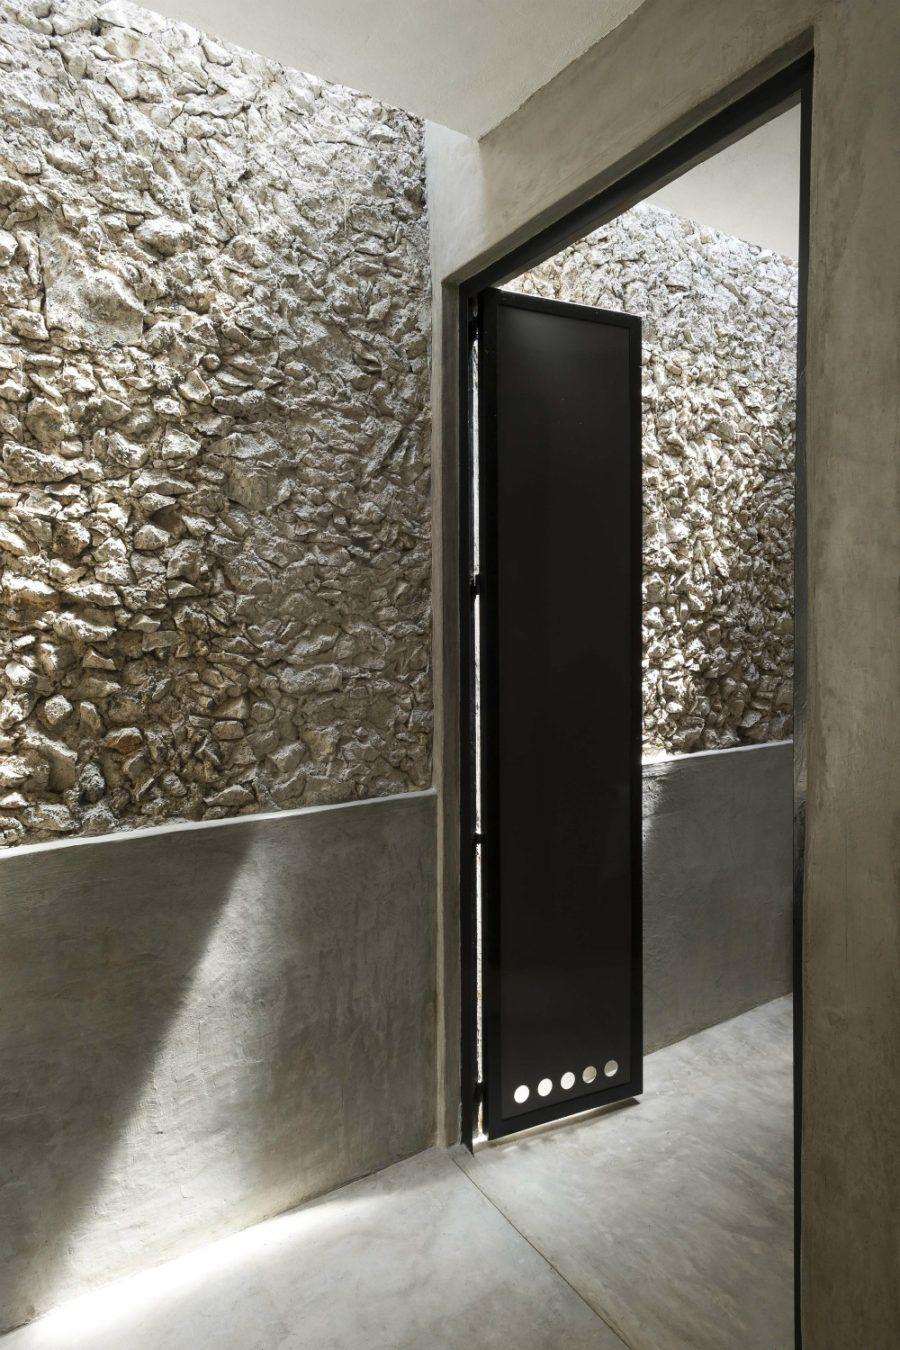 50 Contemporary Modern Interior Door Designs For Most: Modern Interior Door Designs For Most Stylish Room